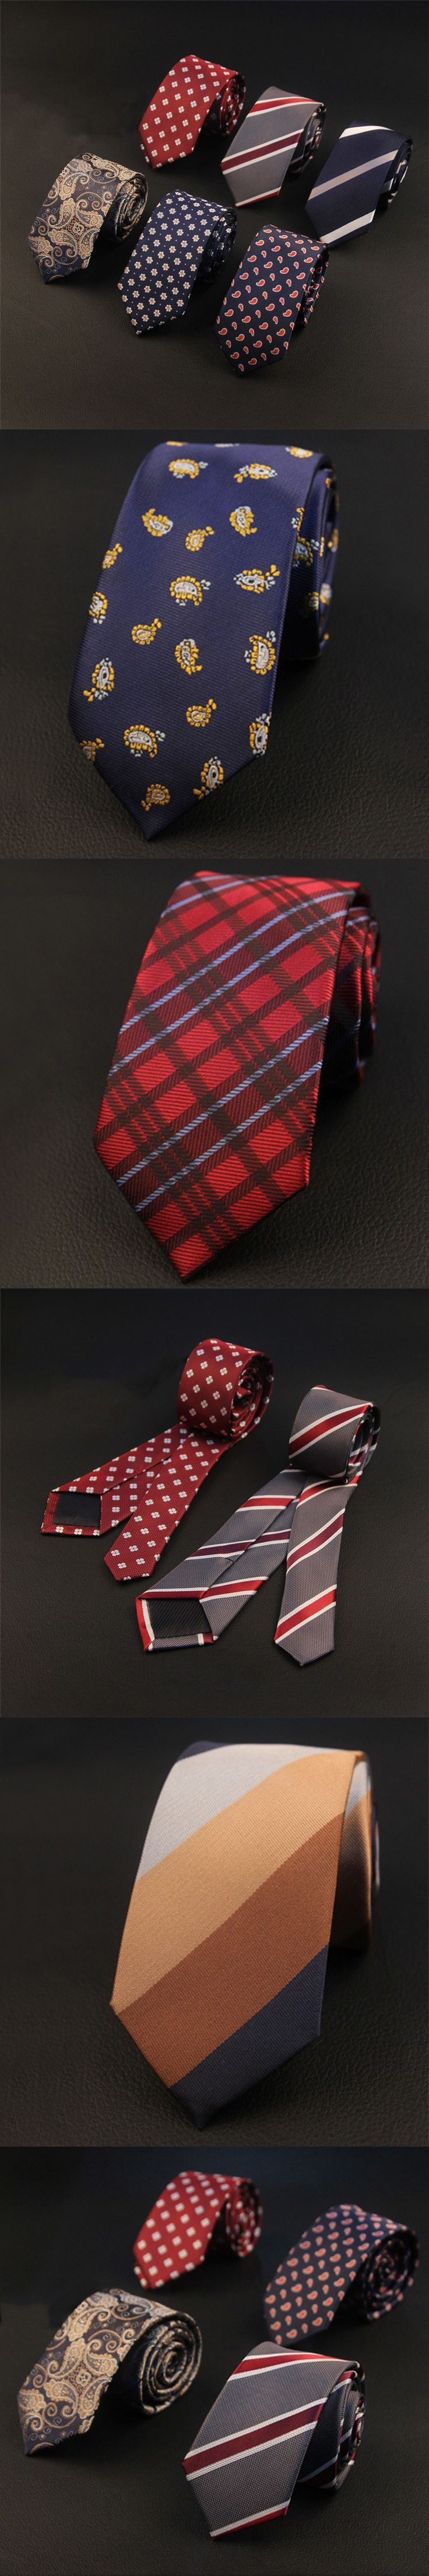 Mantieqingway Leisure Necktie Wedding Ties for Men Striped Floral 6cm Polyester Neck Tie Gravata Black Slim Vestidos Cravats Tie